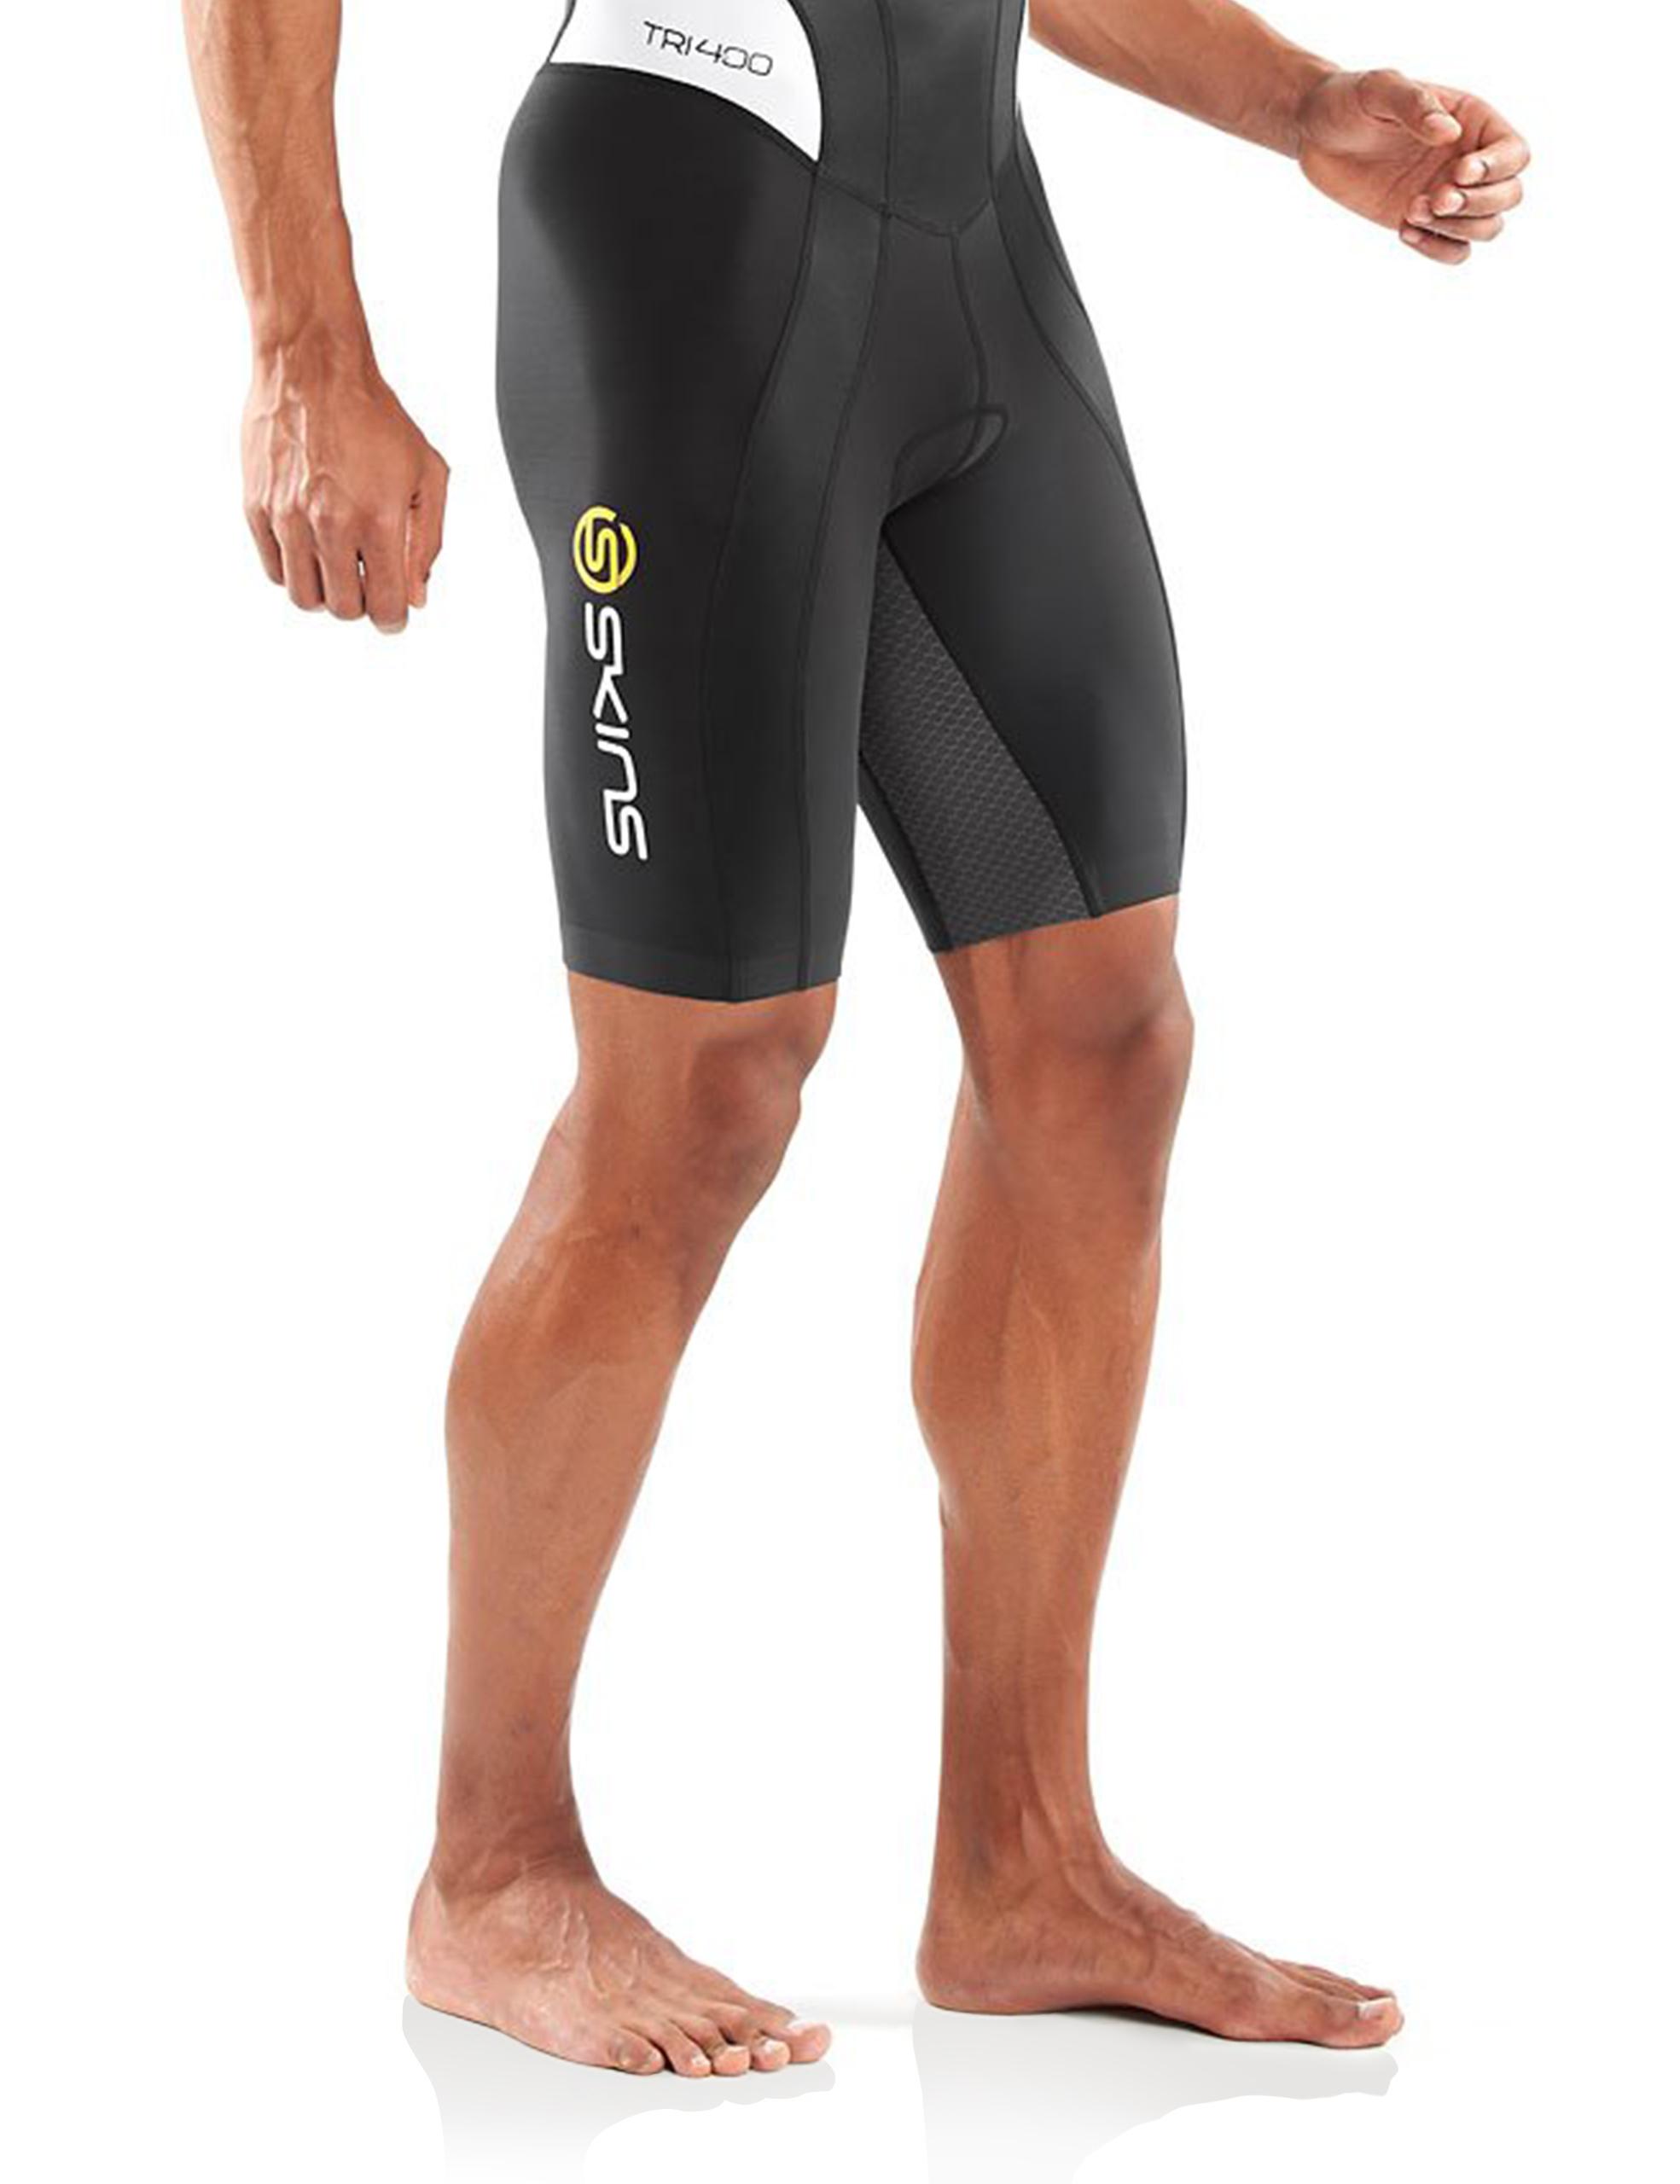 38f667d56b2 Swimwear - Swimming: Sports & Outdoors: Competitive Swimwear, Sun ...